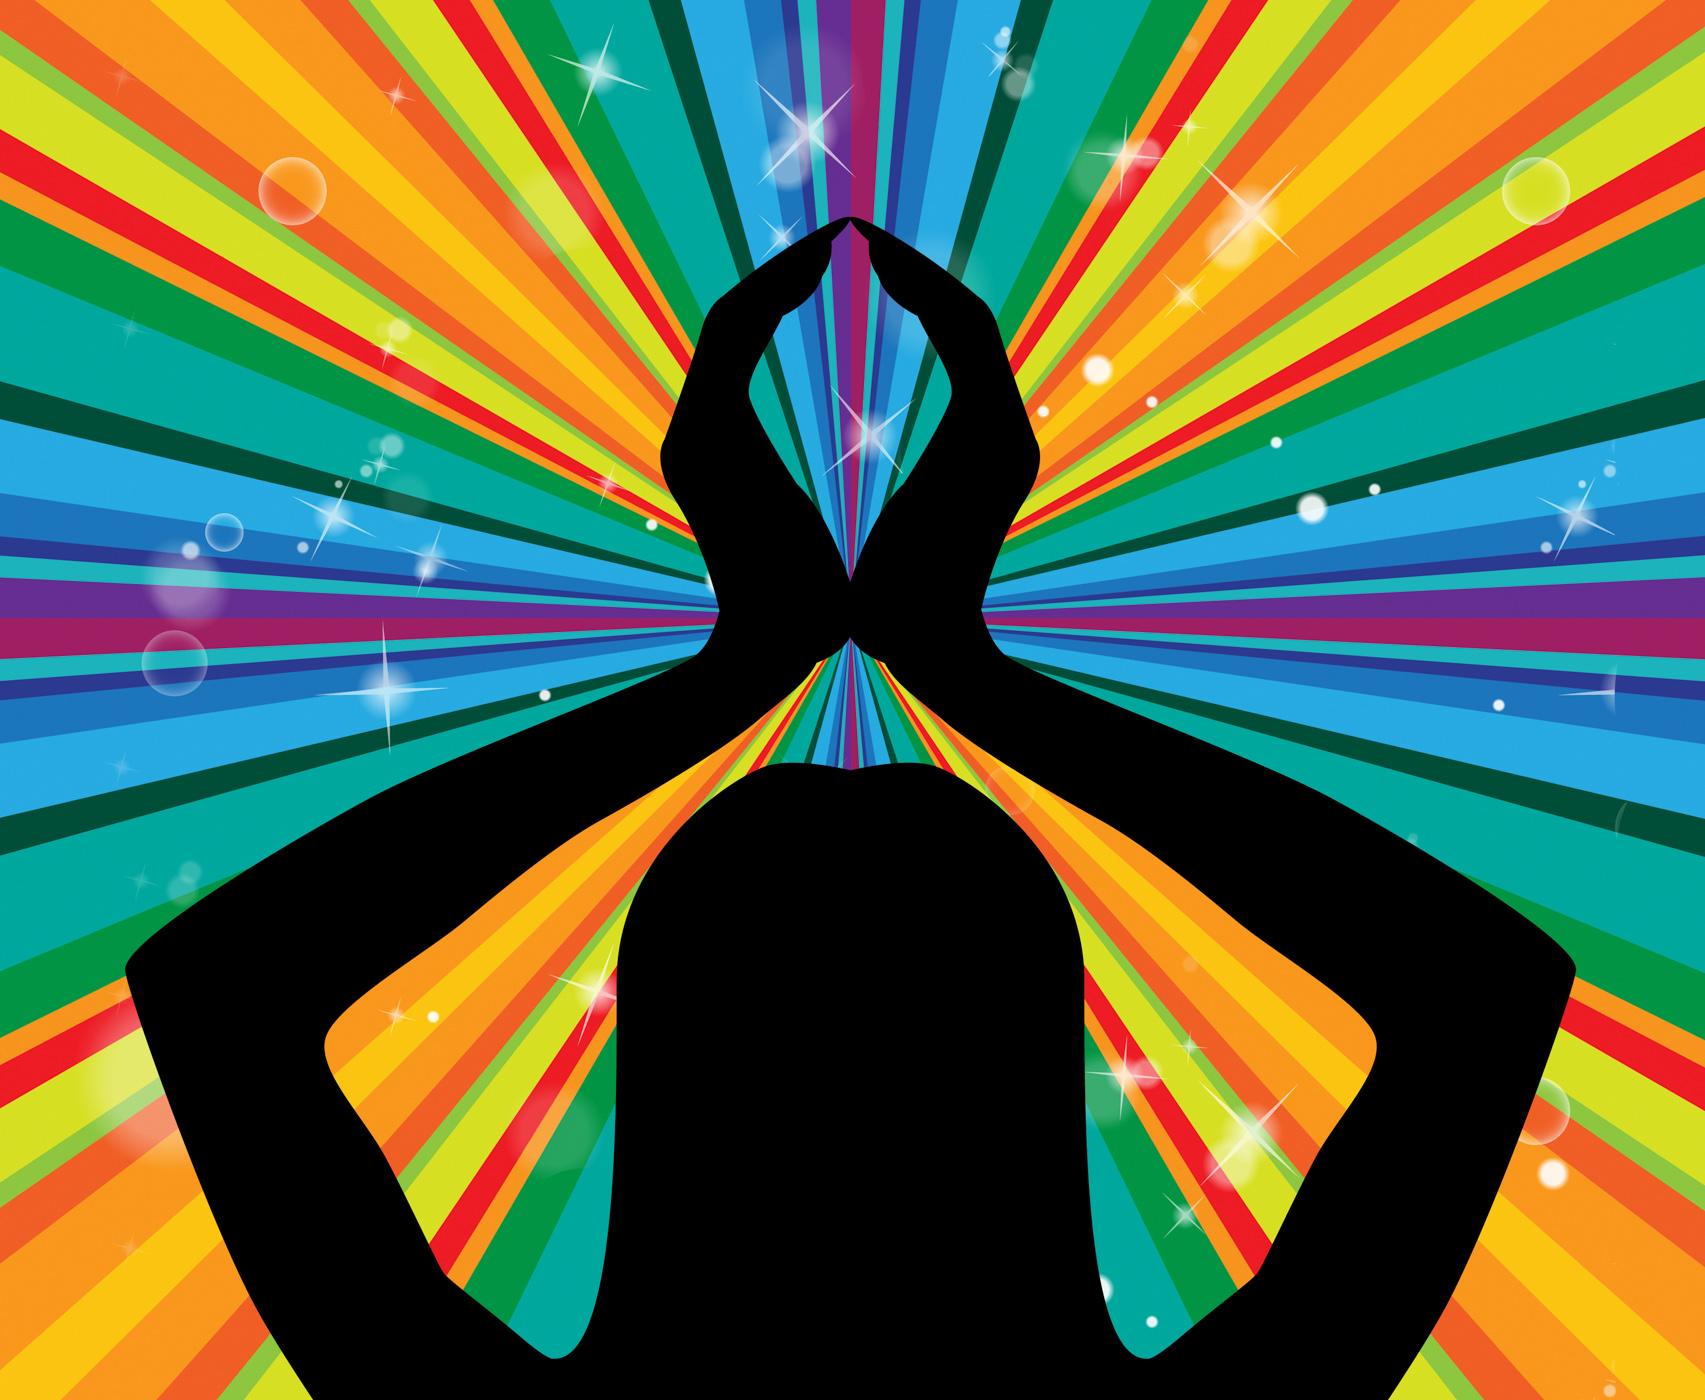 Yoga pose represents silence posture and harmony photo